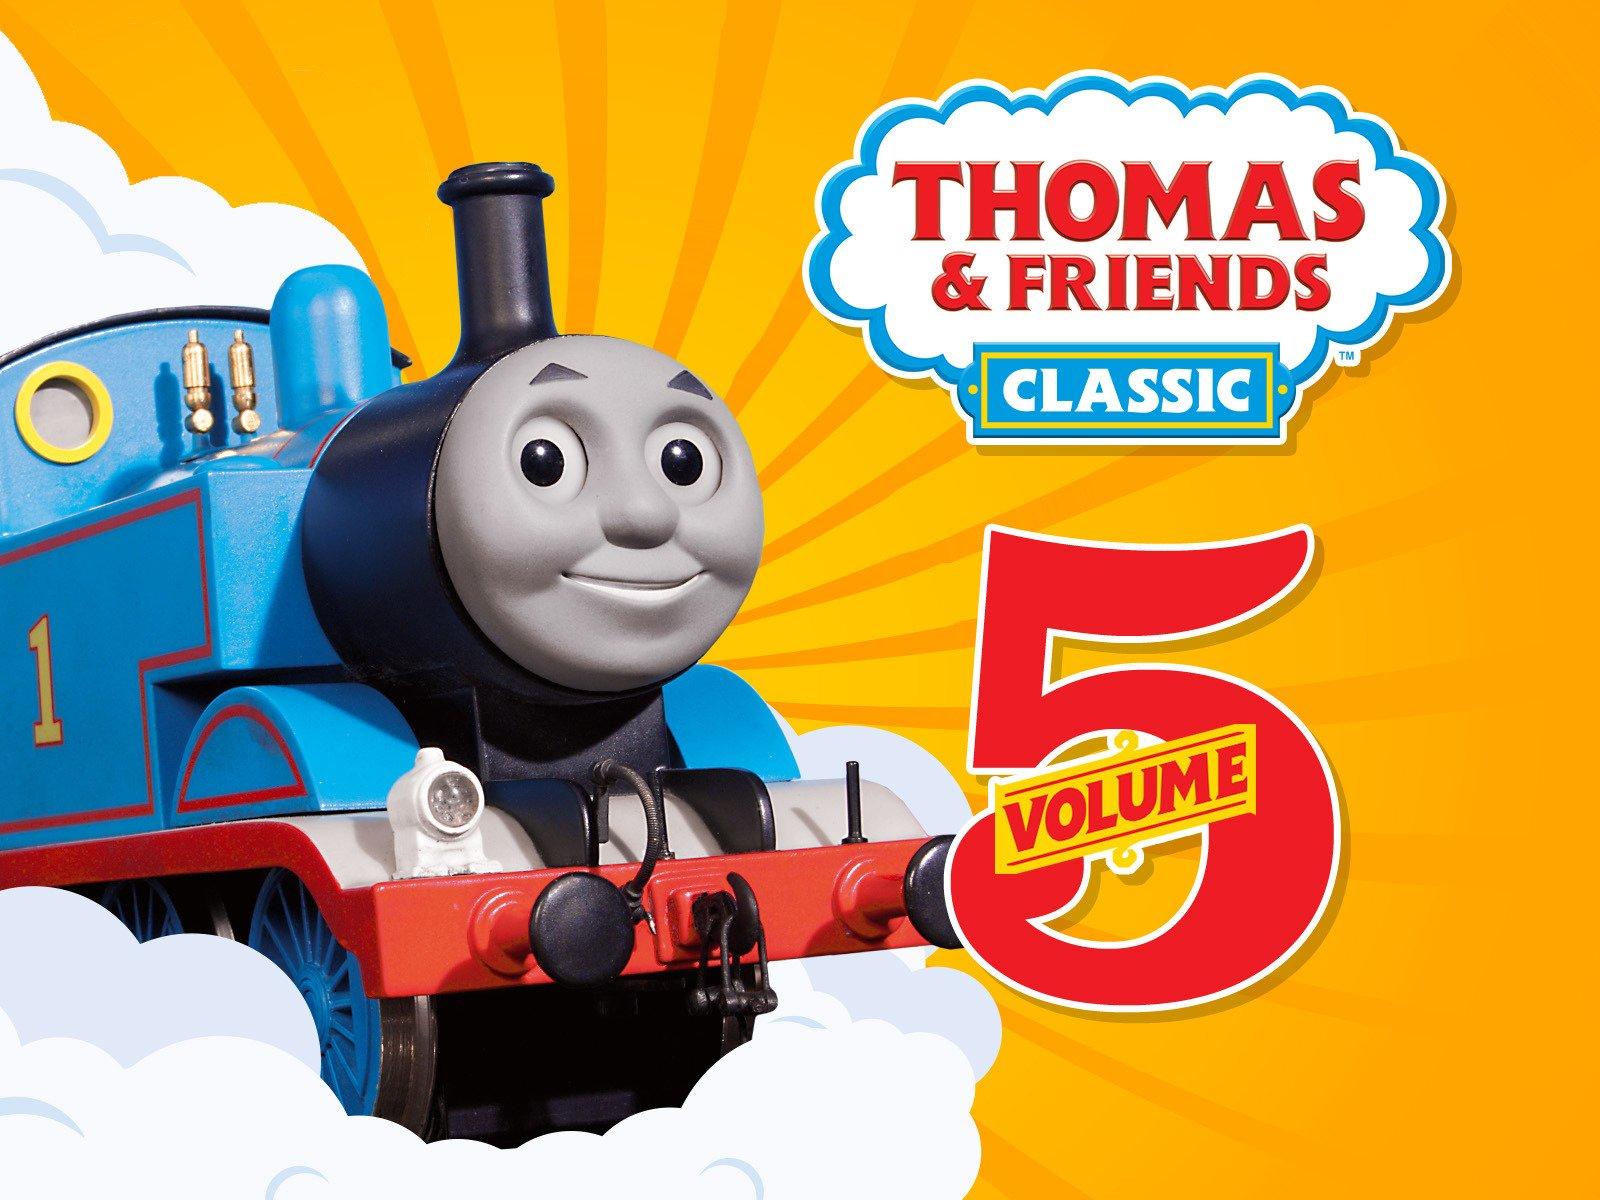 Thomas & Friends Classic Volume 5